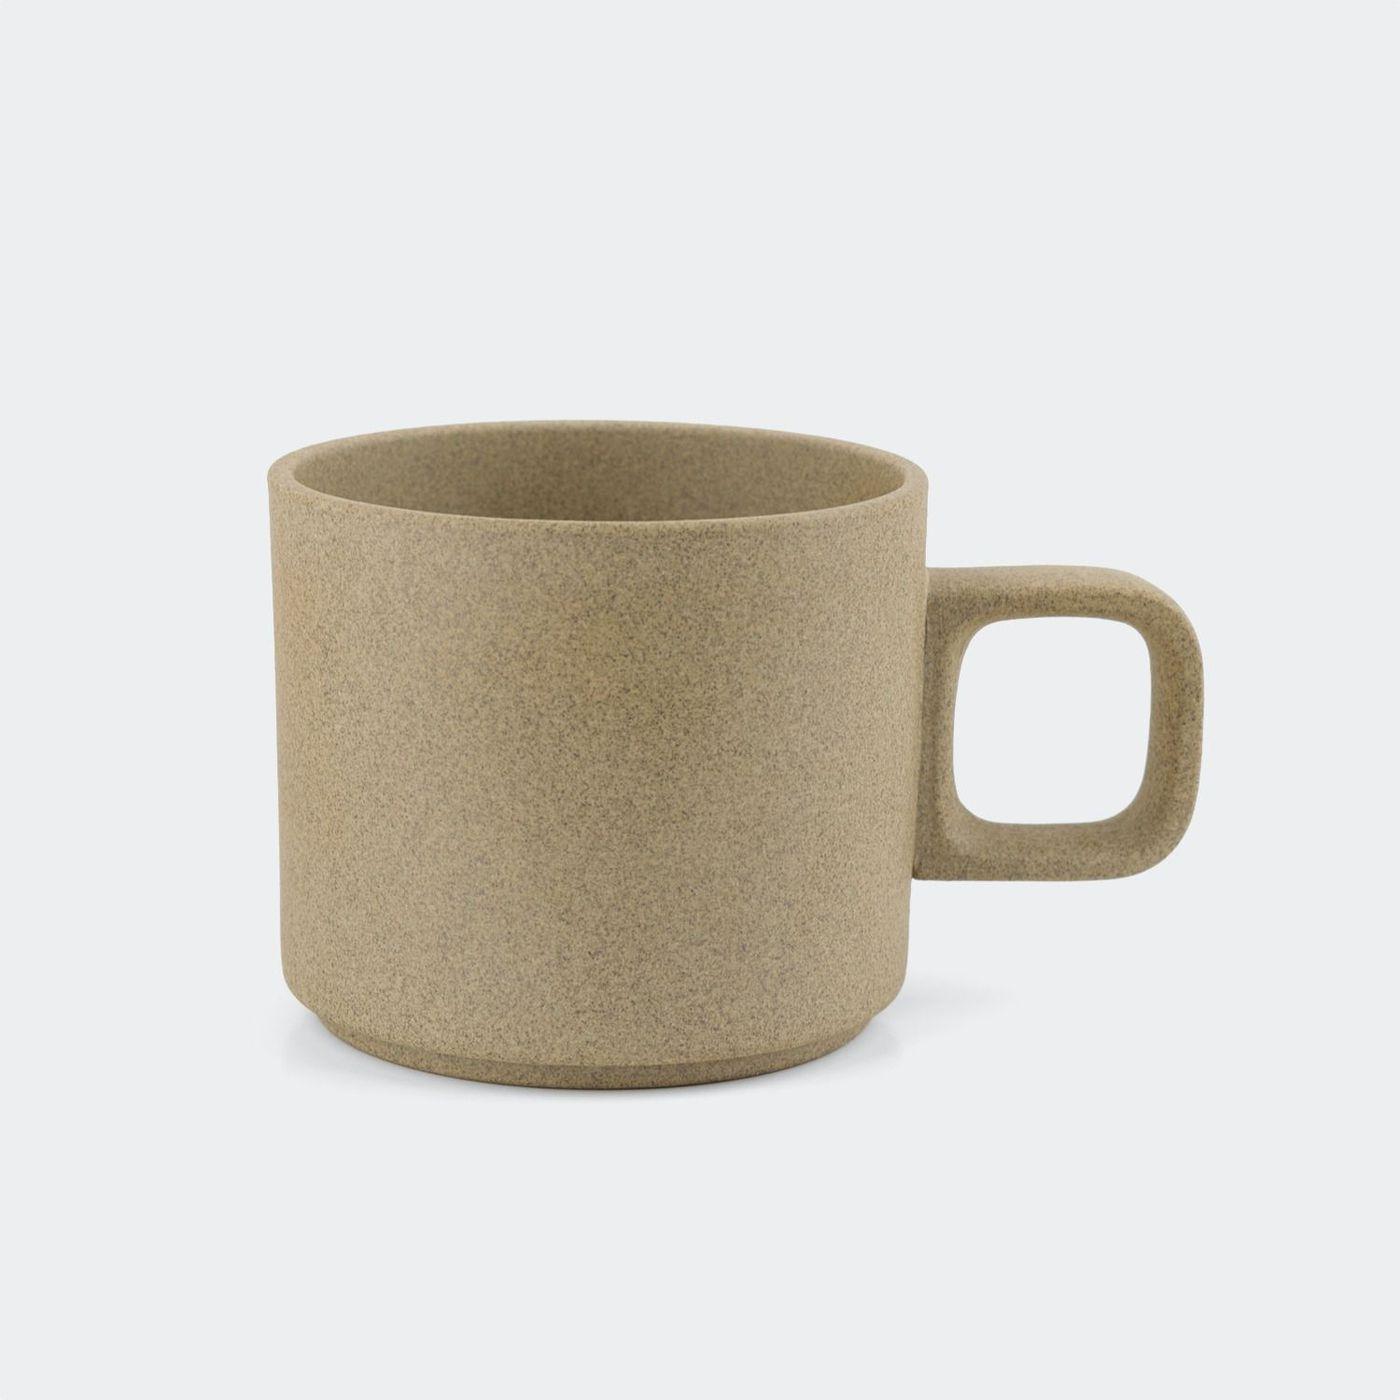 Hasami-Porcelain-Mug-in-Natural-11-oz-compressor_1400x